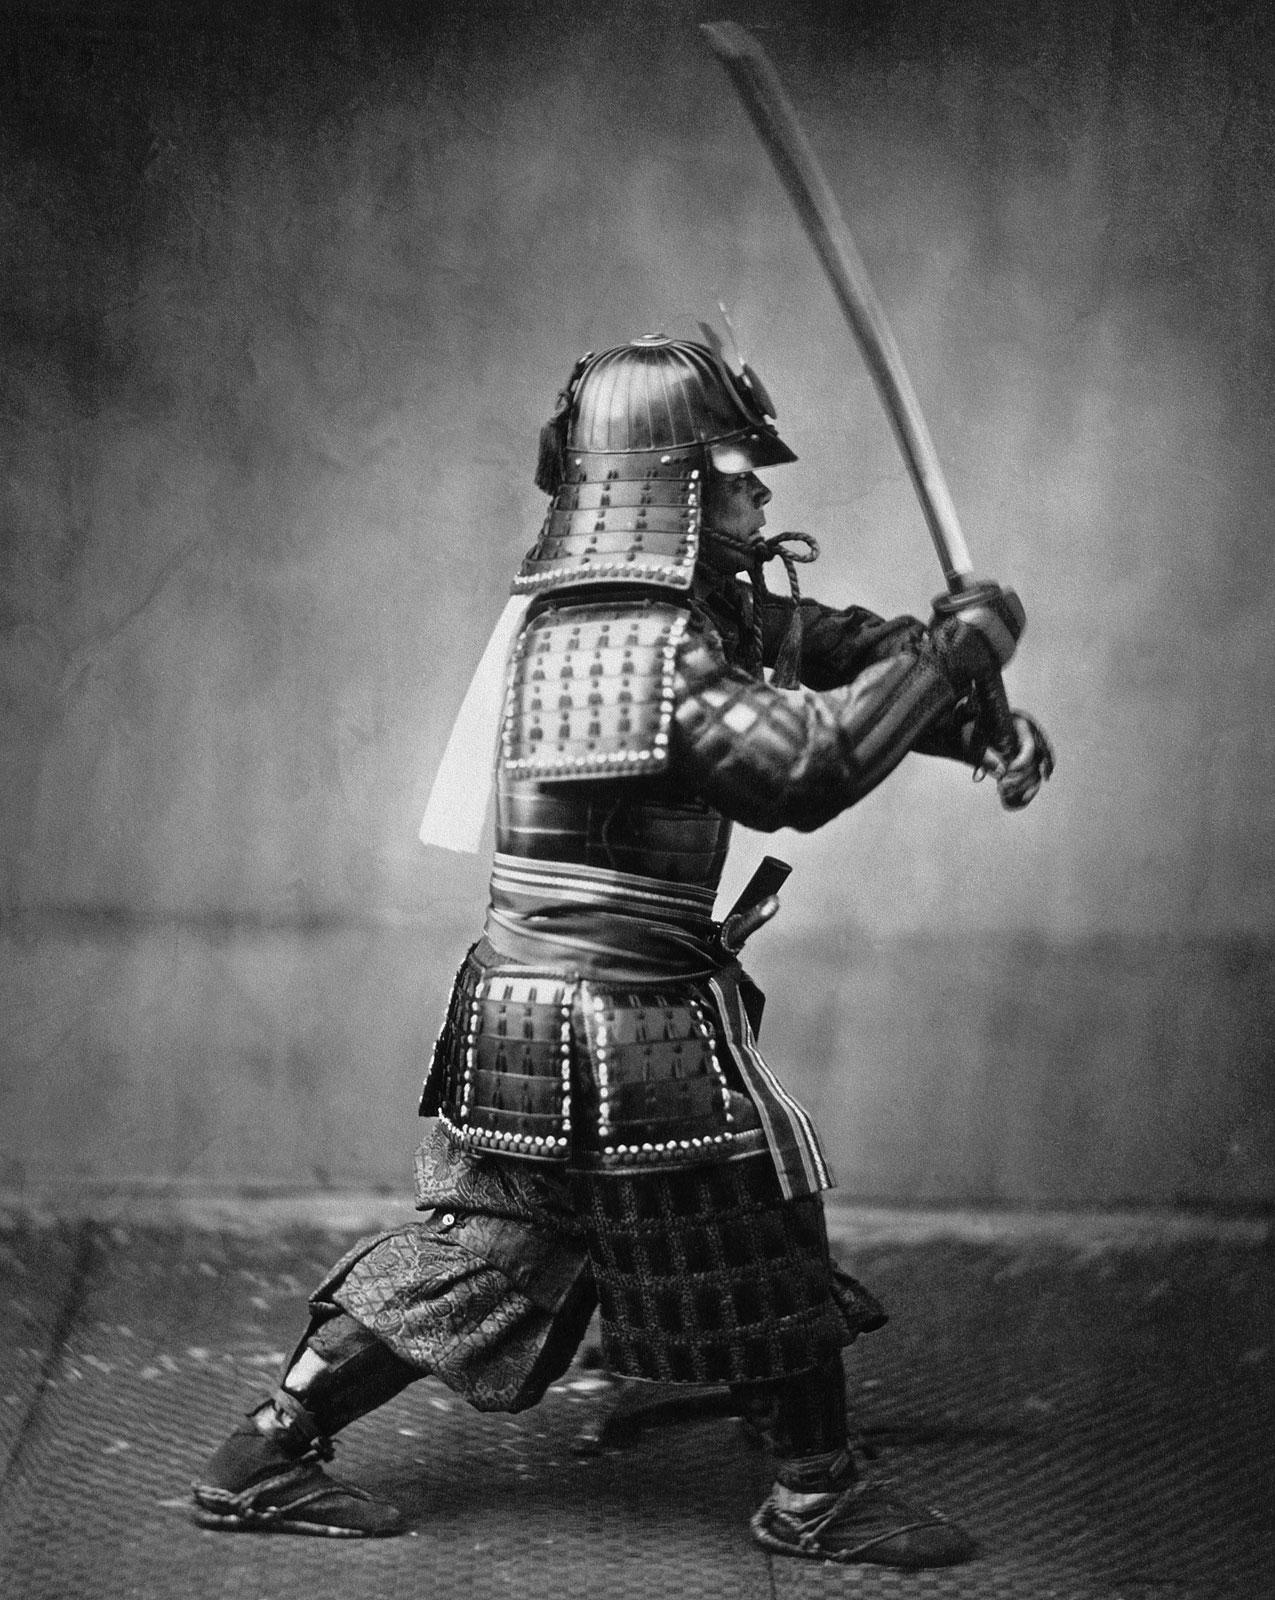 Resultado de imagen para Samurai